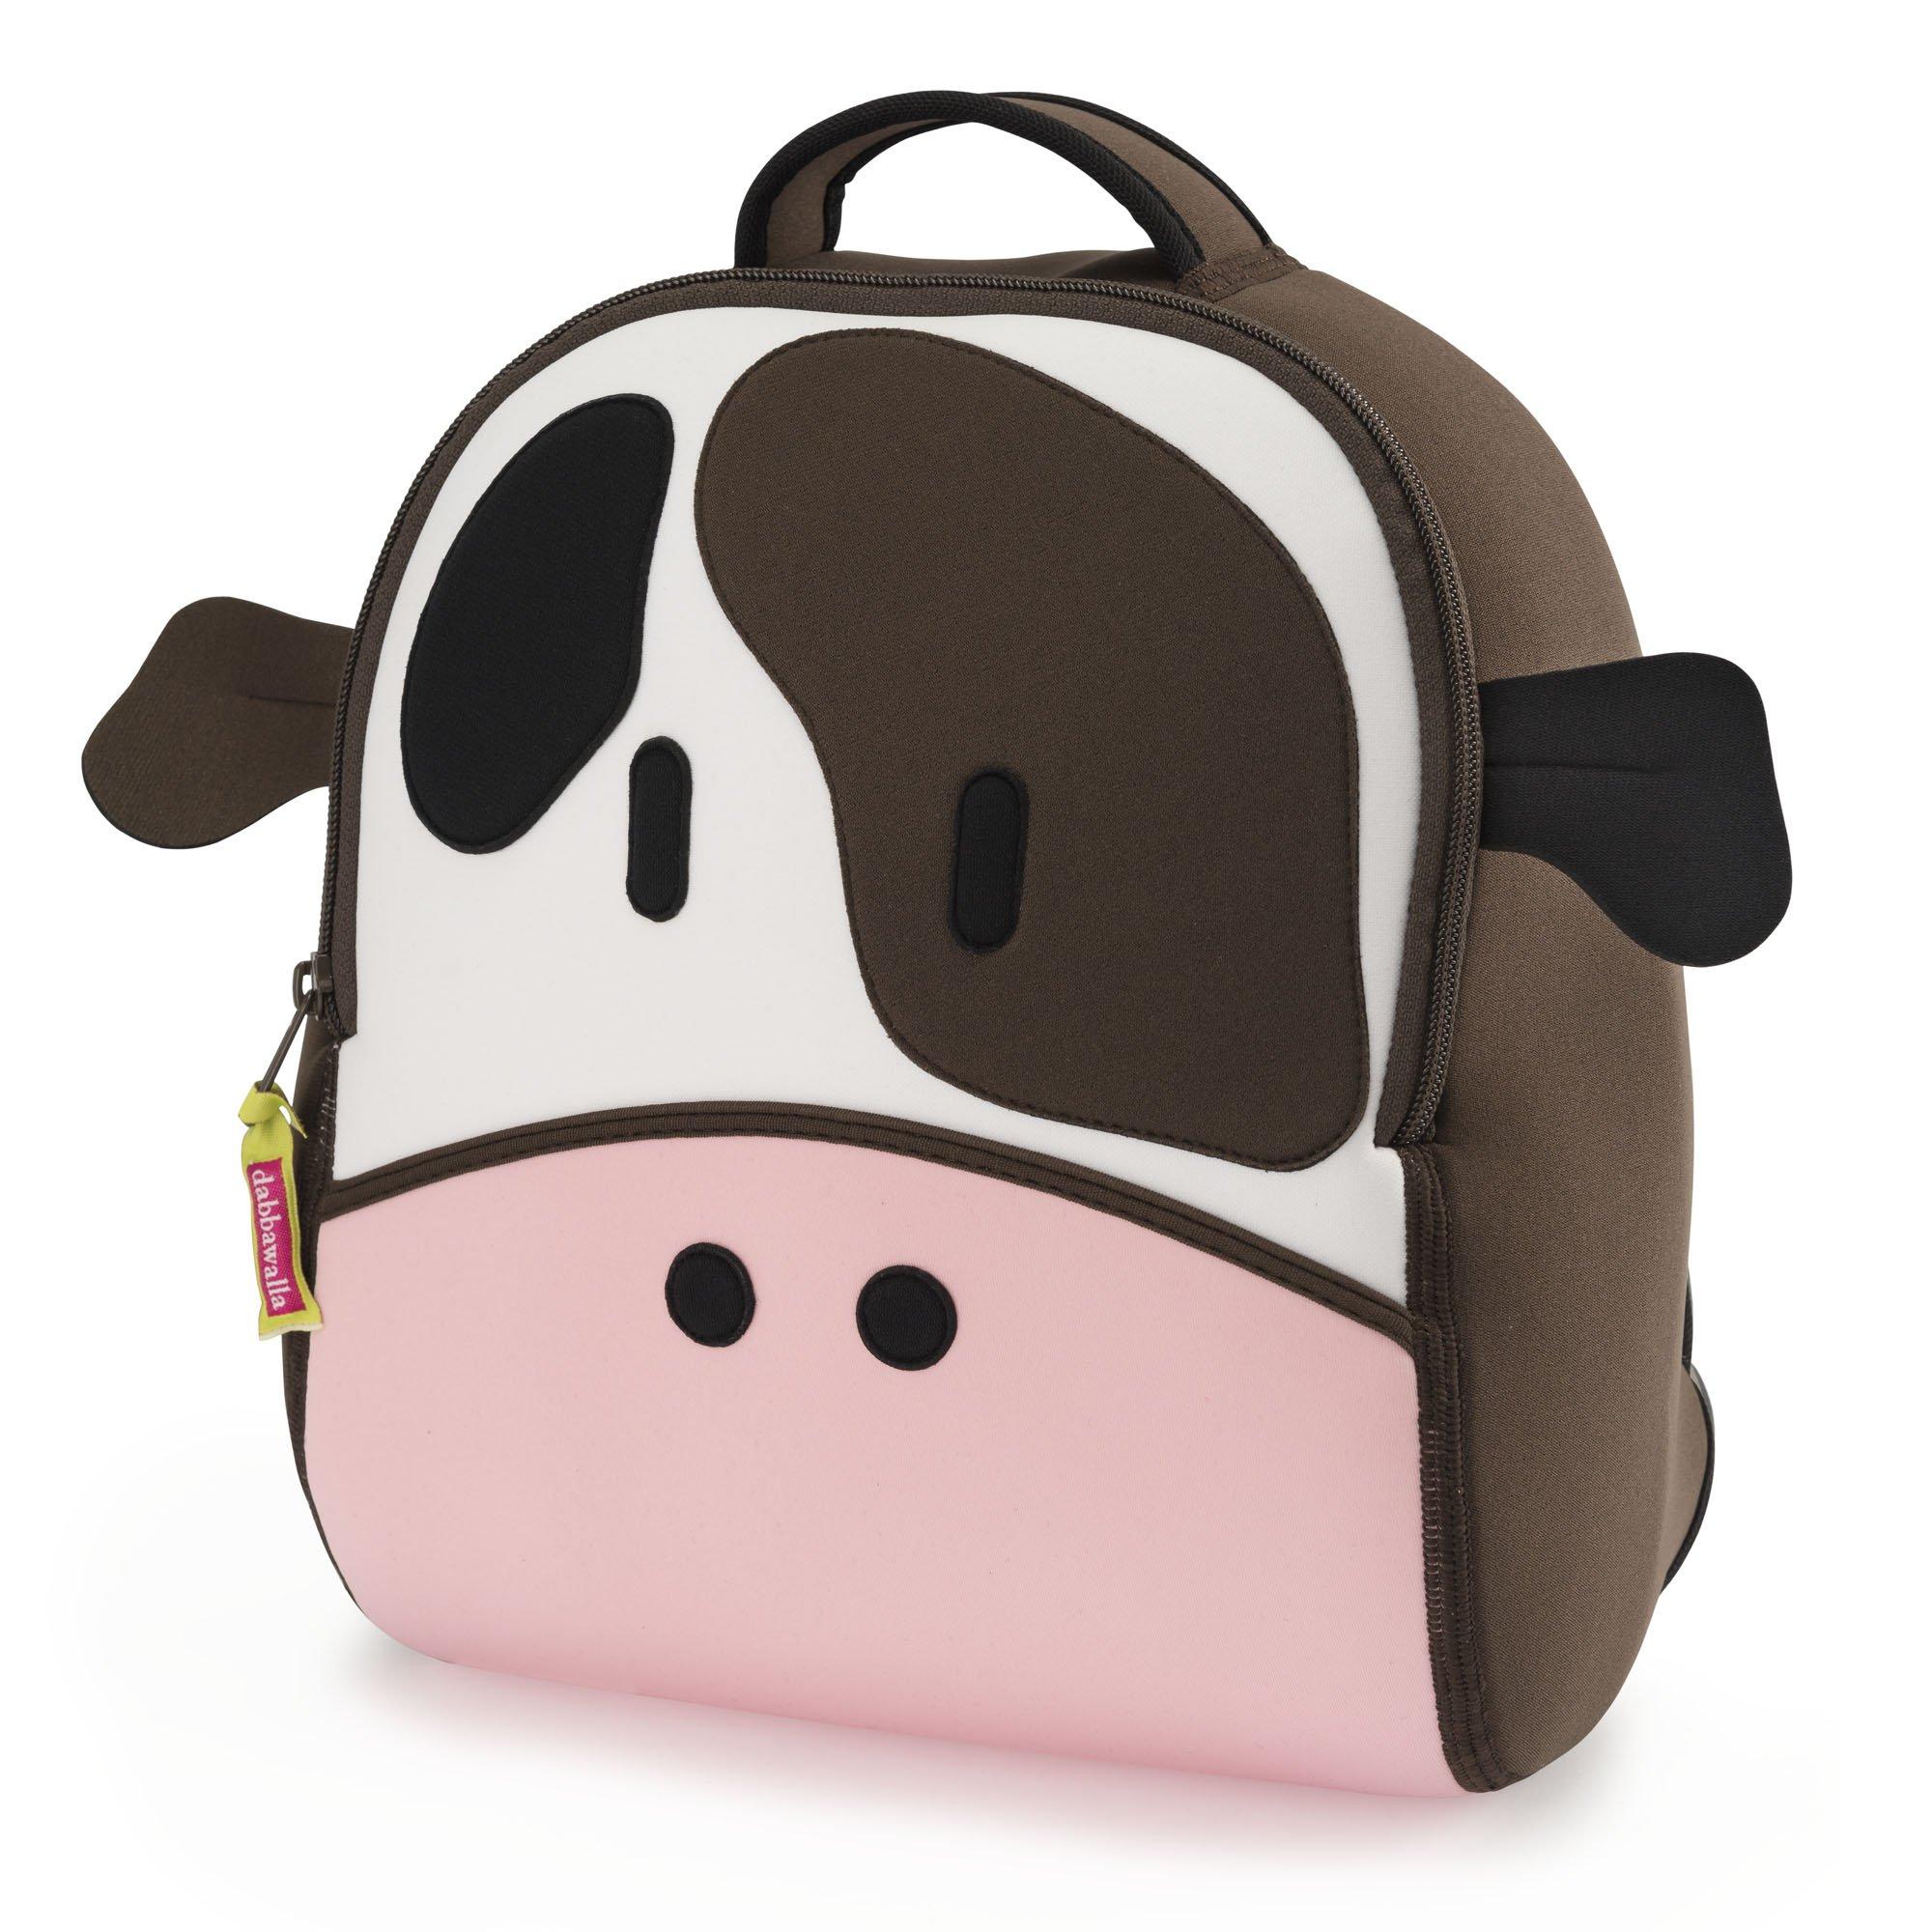 9a1db4f7f559 Amazon.com  Dabbawalla bags Cow Backpack